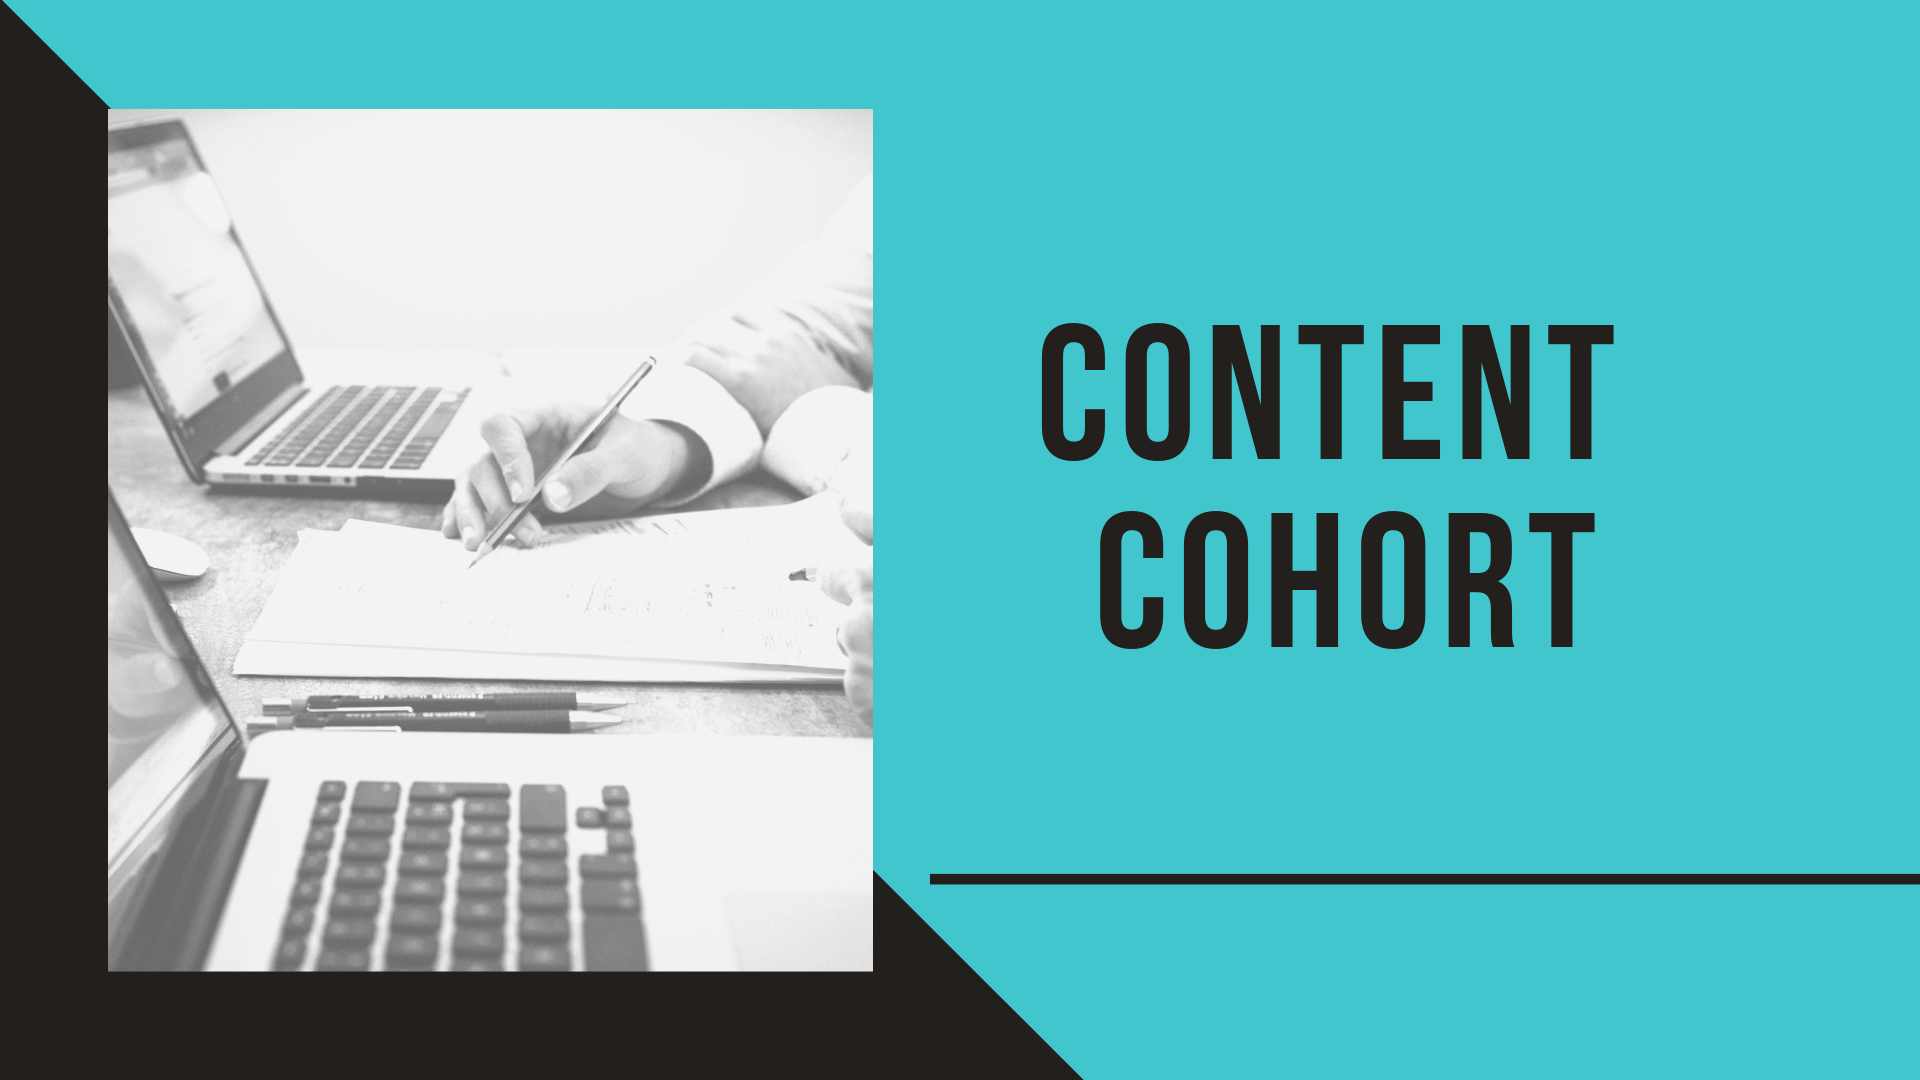 Content Cohort